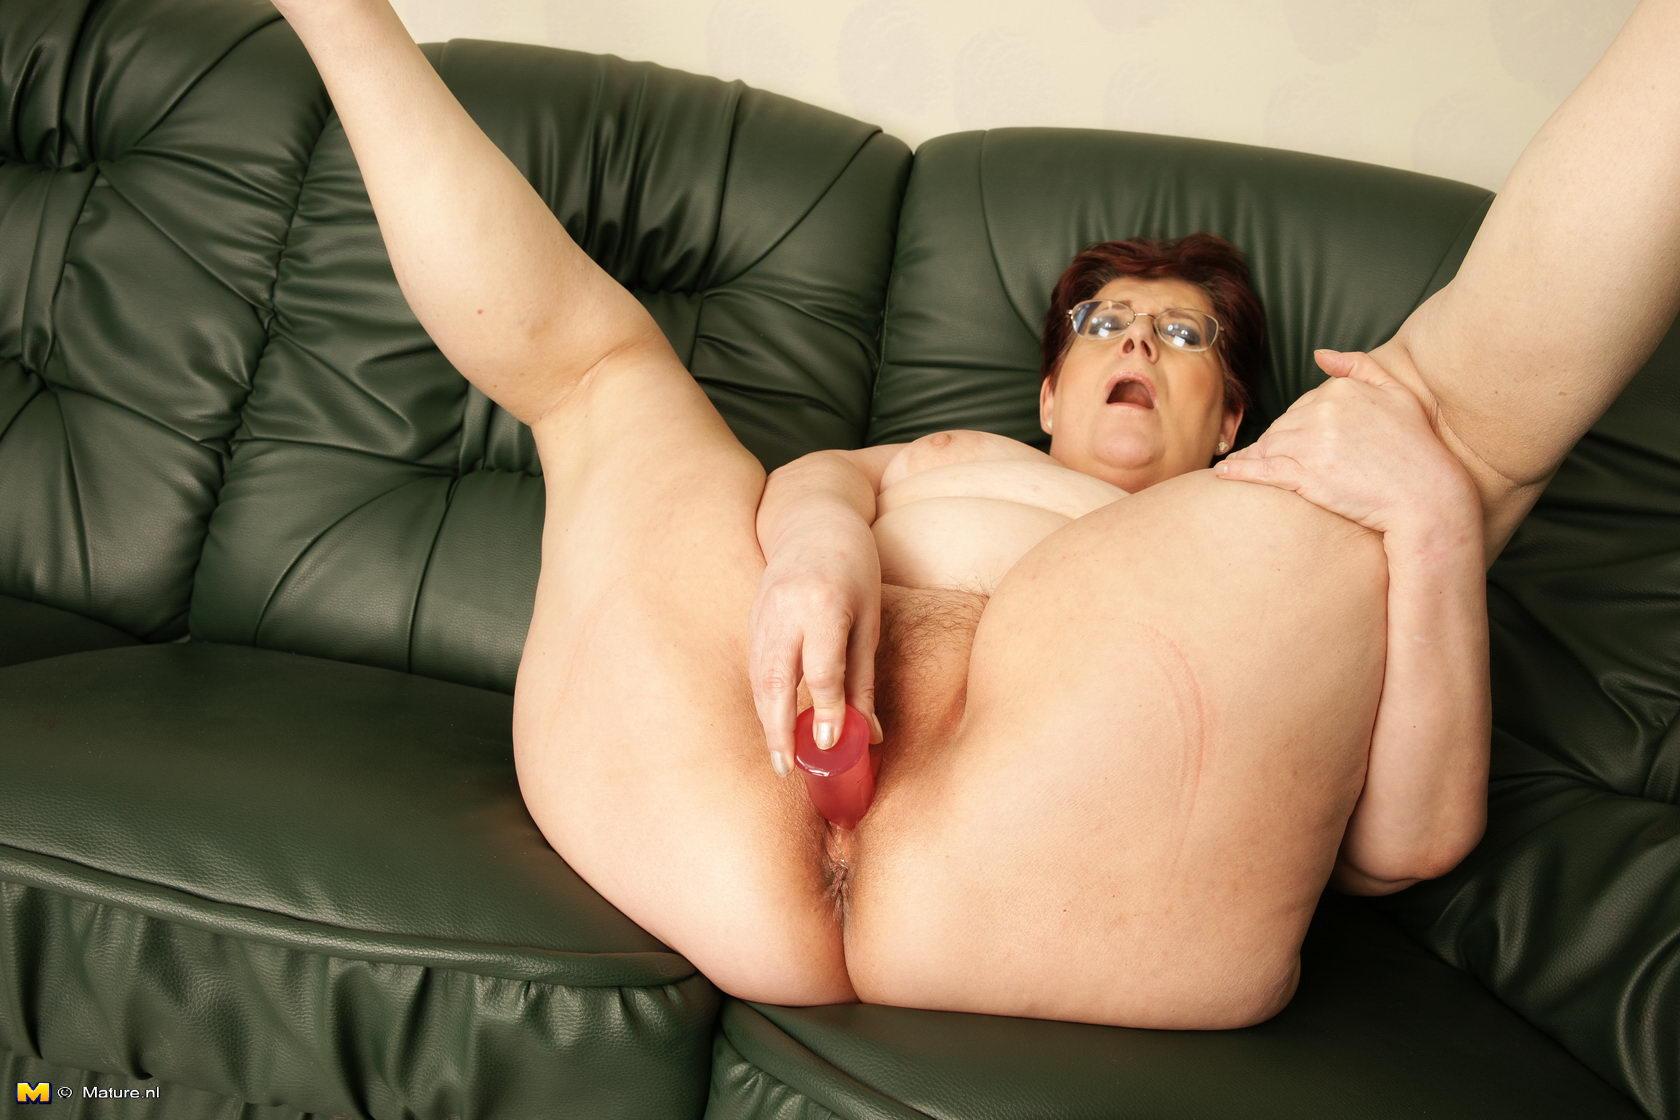 Horny fat ass granny gloryhole 64 - 1 part 4